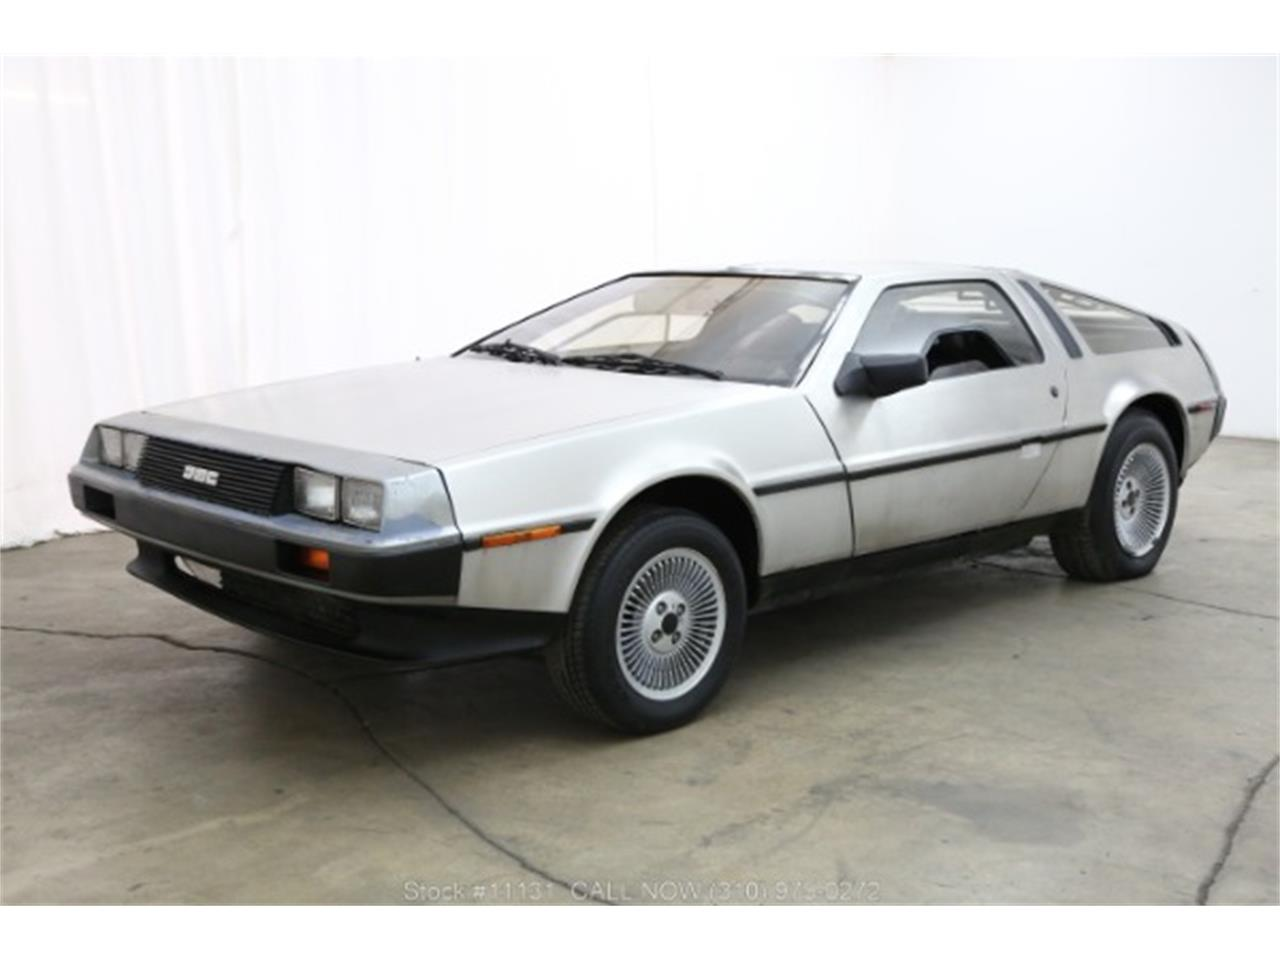 Large Picture of 1981 DeLorean DMC-12 located in California - $19,500.00 - QNPP